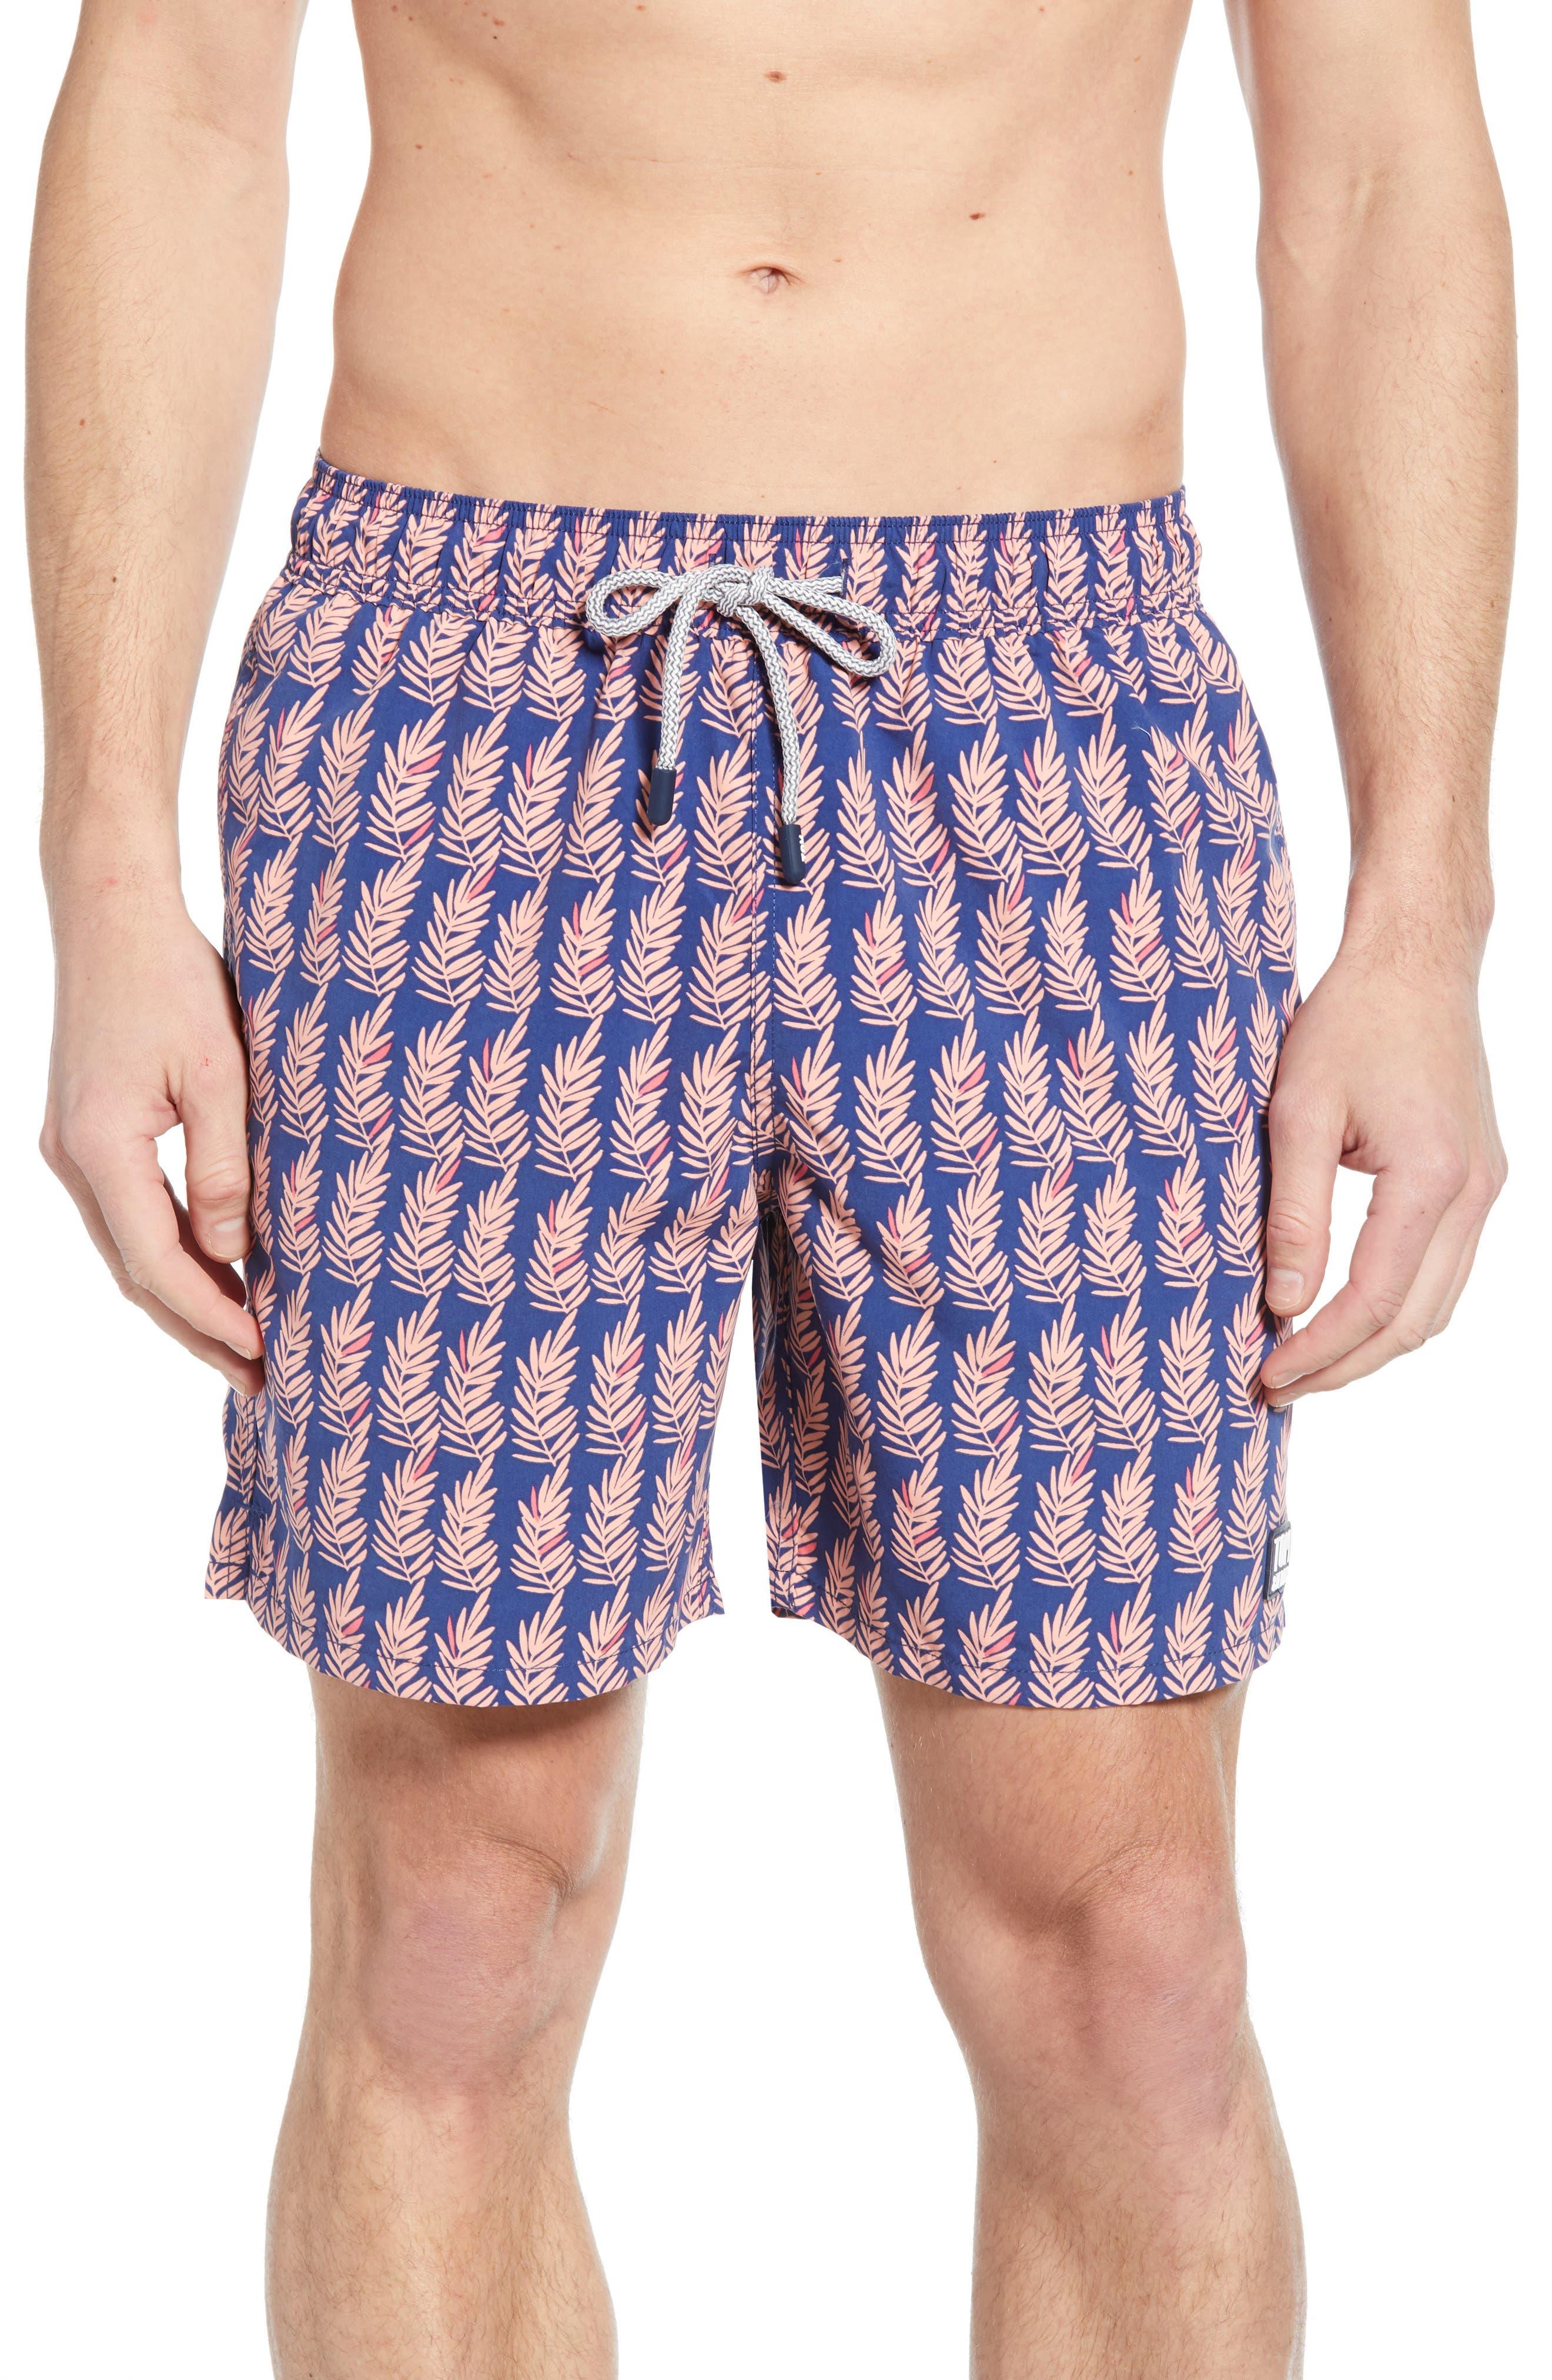 Tom & Teddy Fern Print Swim Trunks, Blue